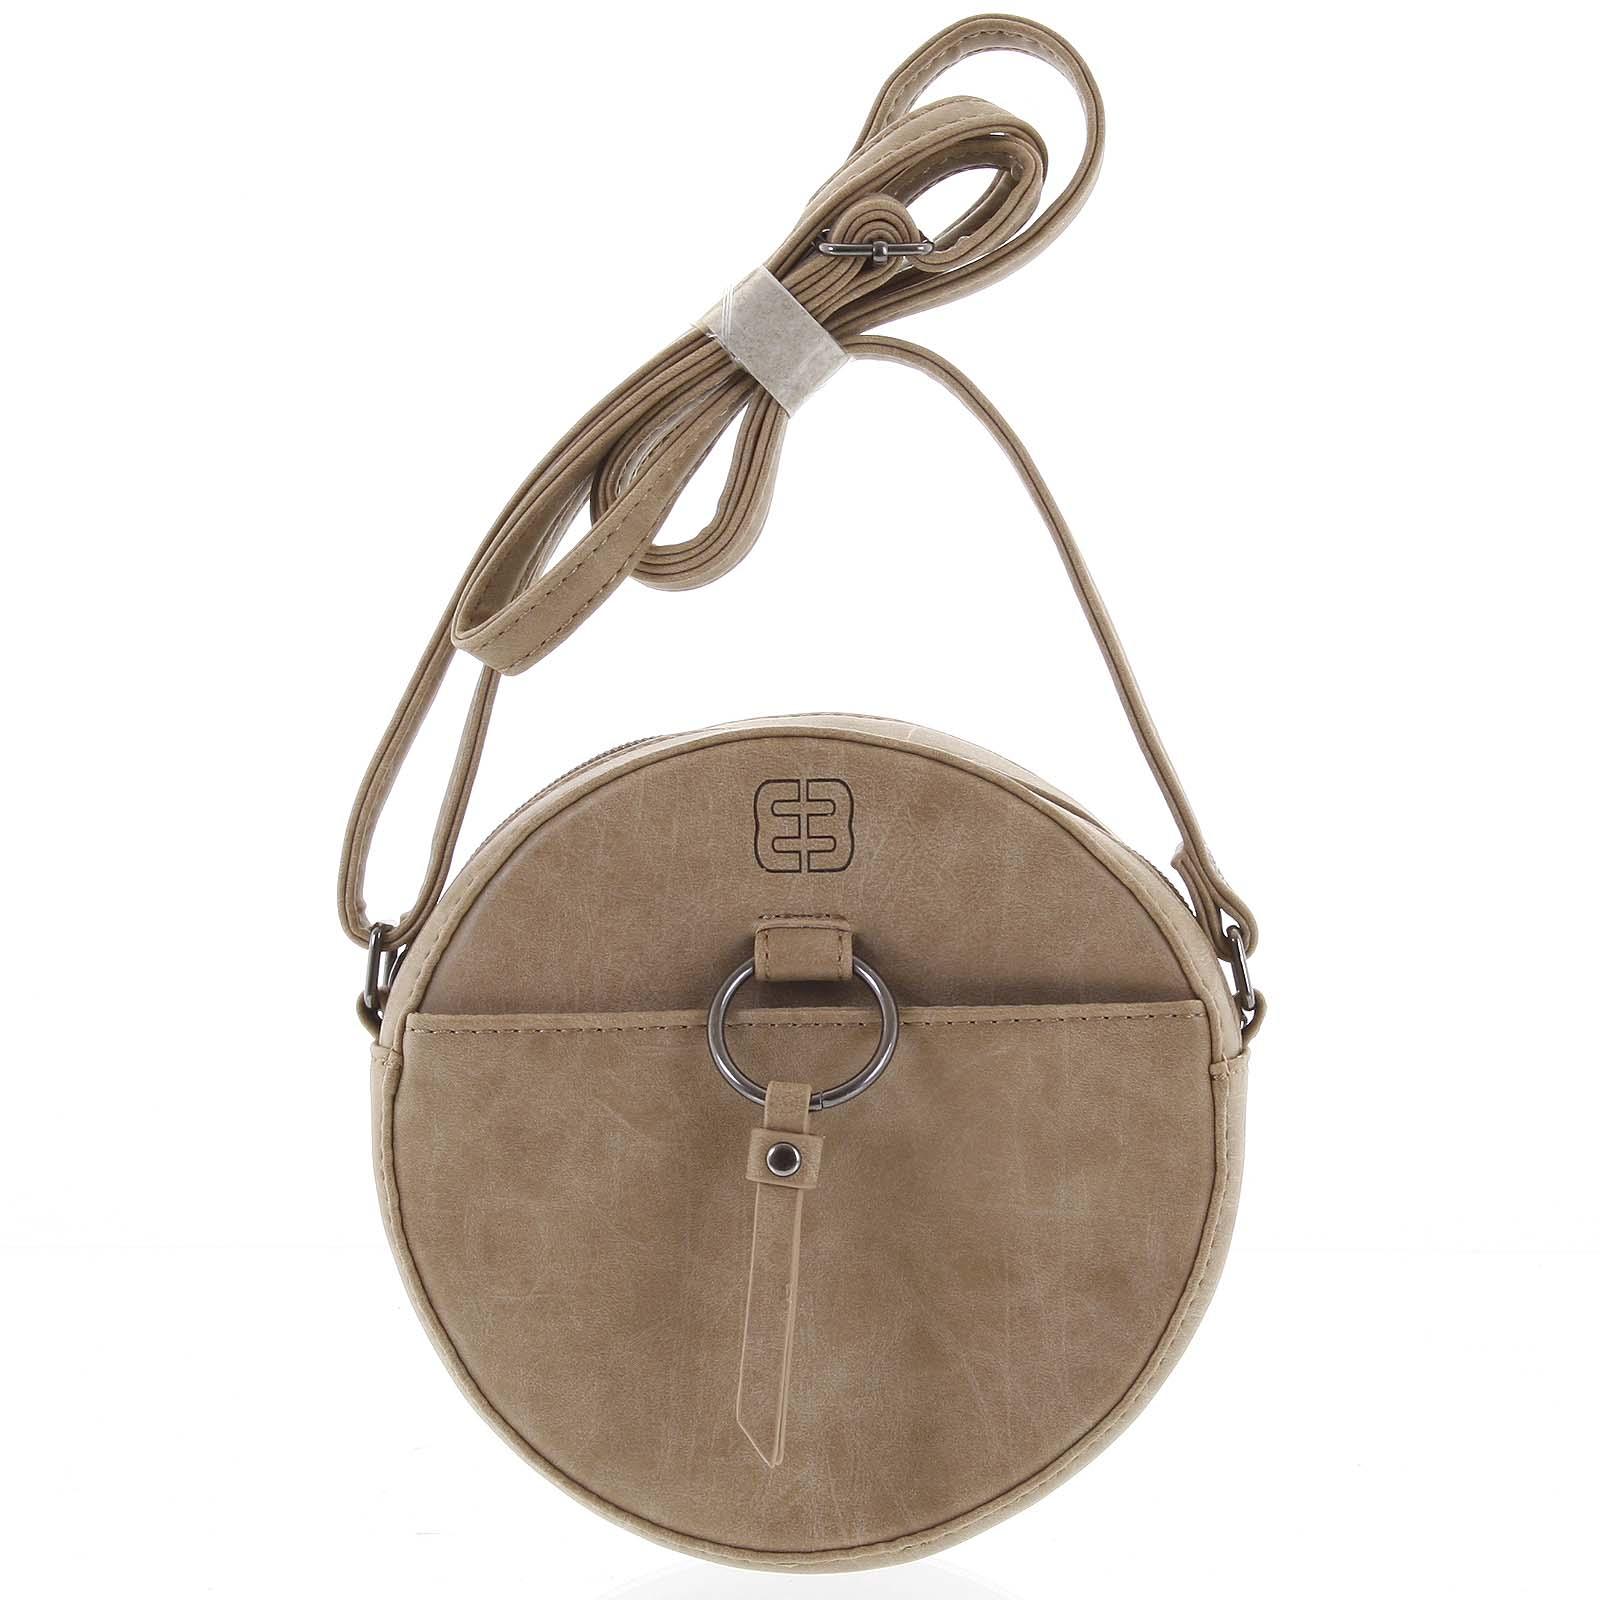 Guľatá moderná dámska crossbody kabelka taupe - Enrico Benetti Behesha